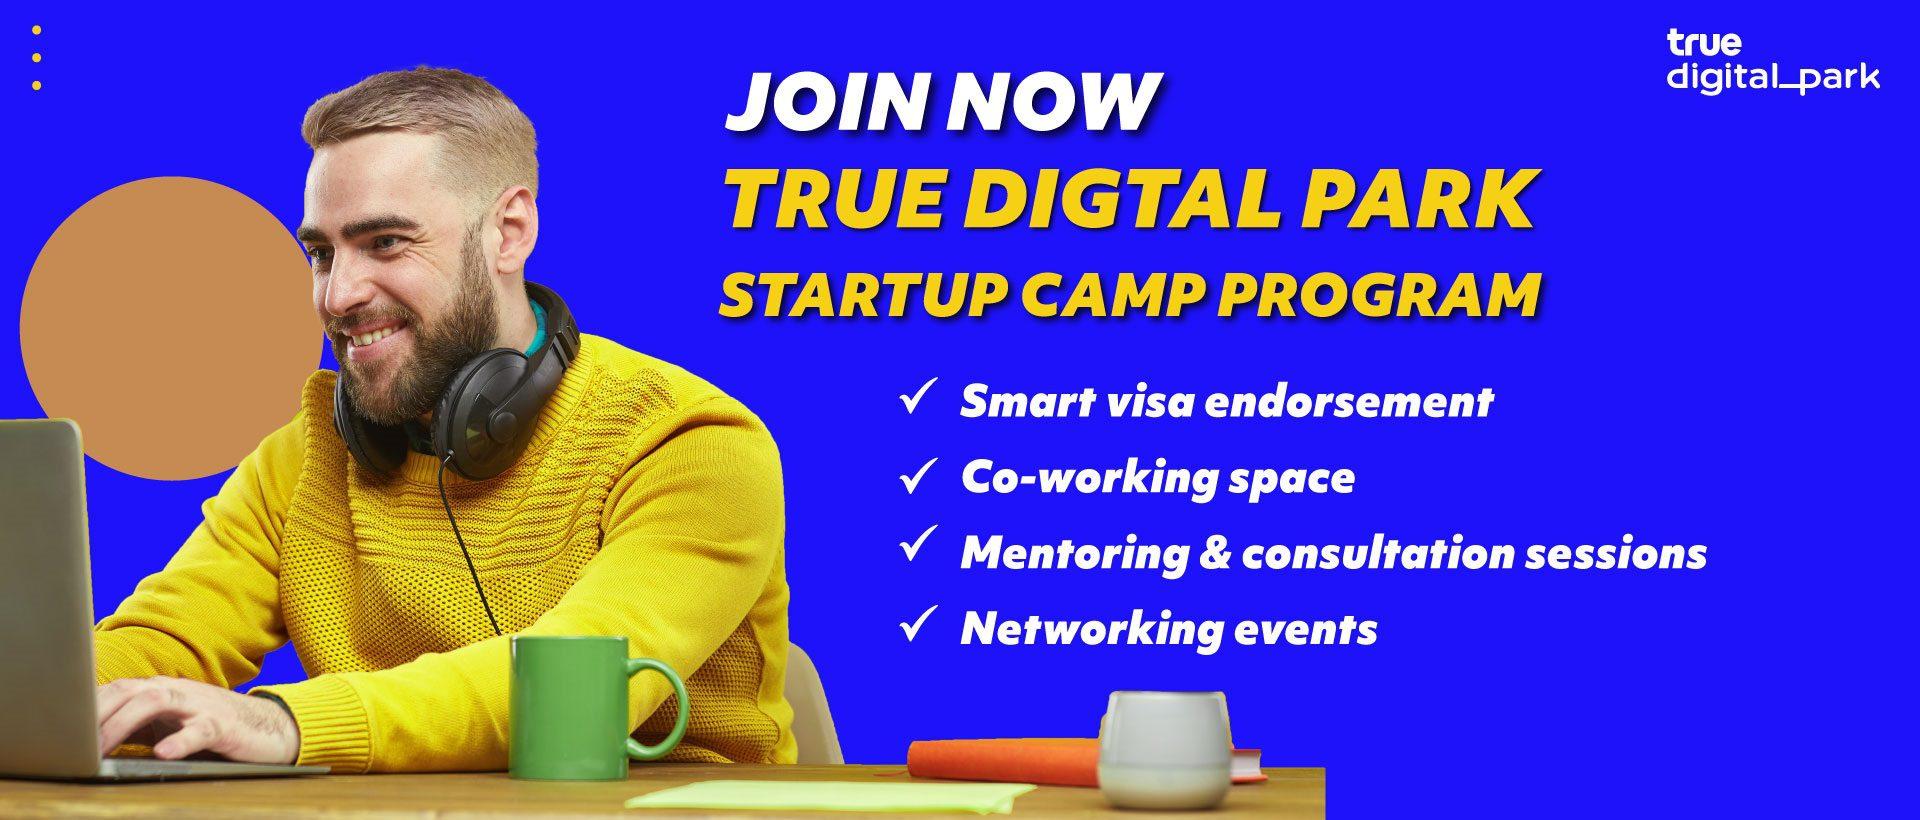 TRUE เปิดโครงการ True Digital Park Startup Camp หนุนสตาร์ทอัพต่างชาติลงทุนไทย